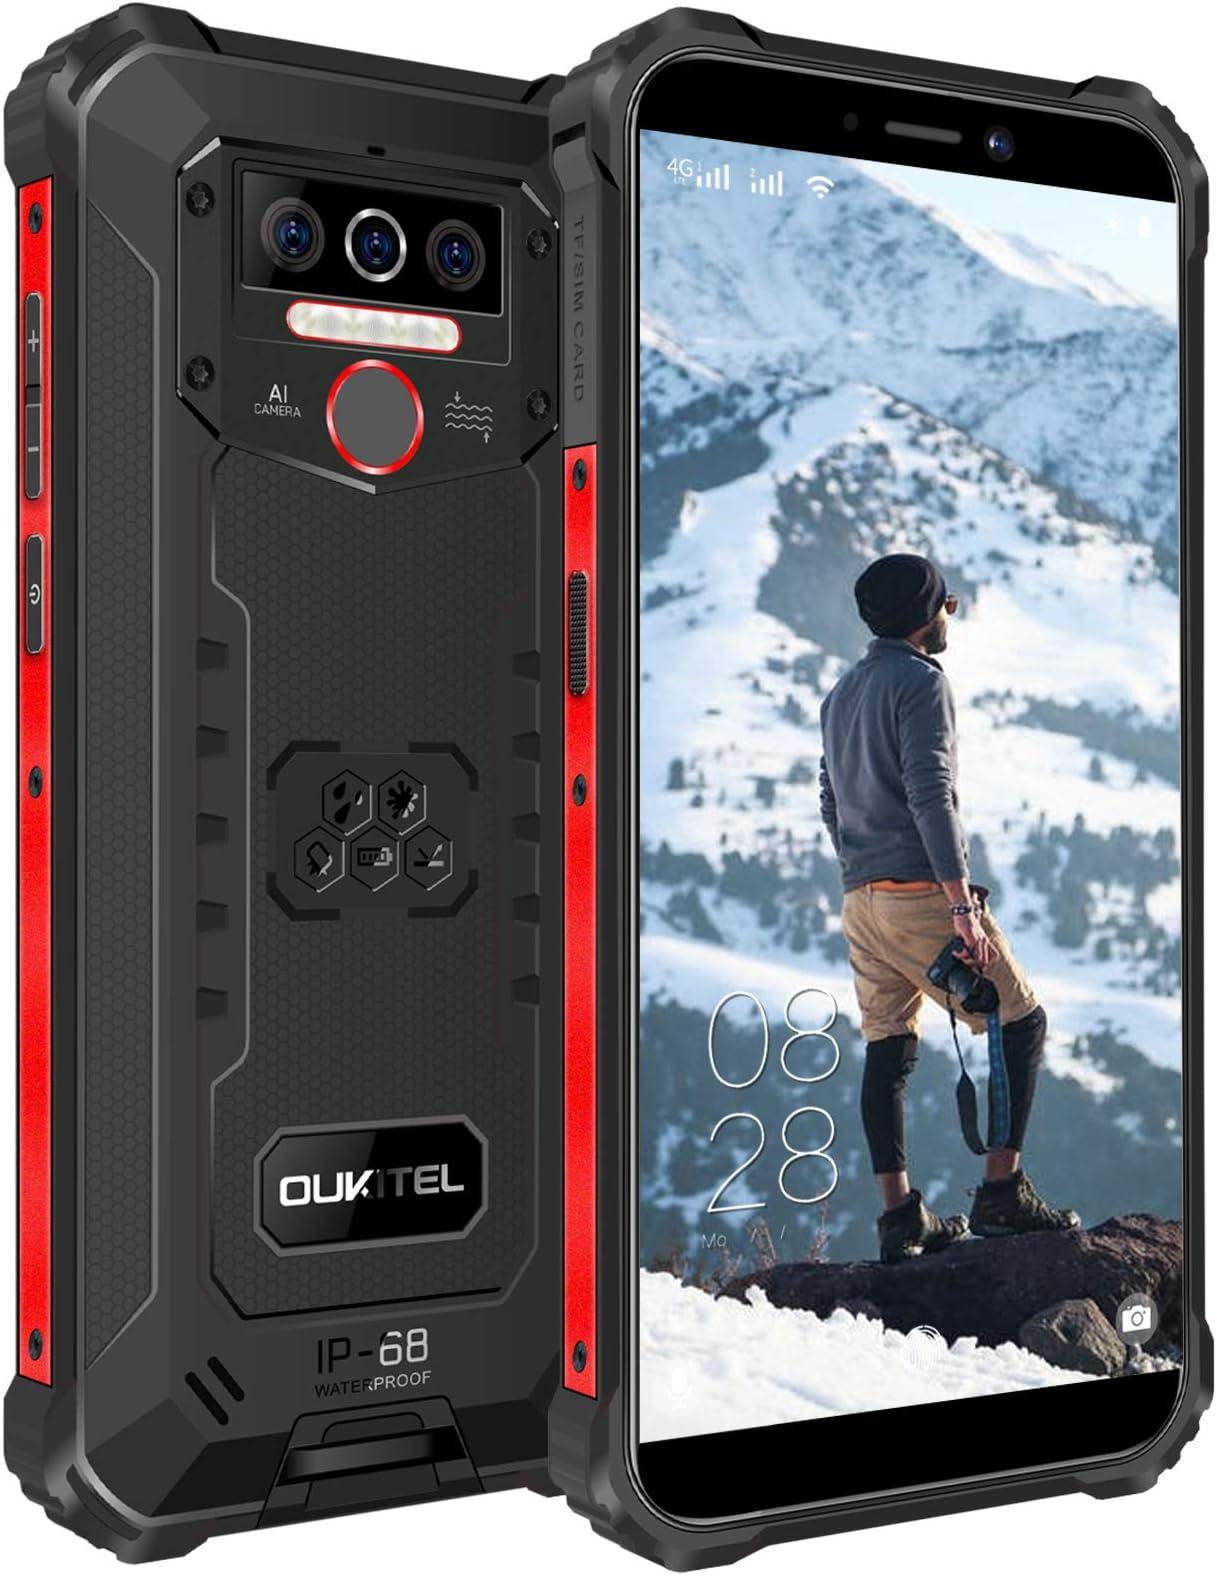 "OUKITEL WP5 Rugged Cell Phone Unlocked, Android 10 Smartphone 8000mAh Battery IP68 Waterproof Rugged Smartphone, 5.5"" HD+ 4GB 32GB Face ID Fingerprint Triple Camera Global Version 4G LTE GSM (Black)"